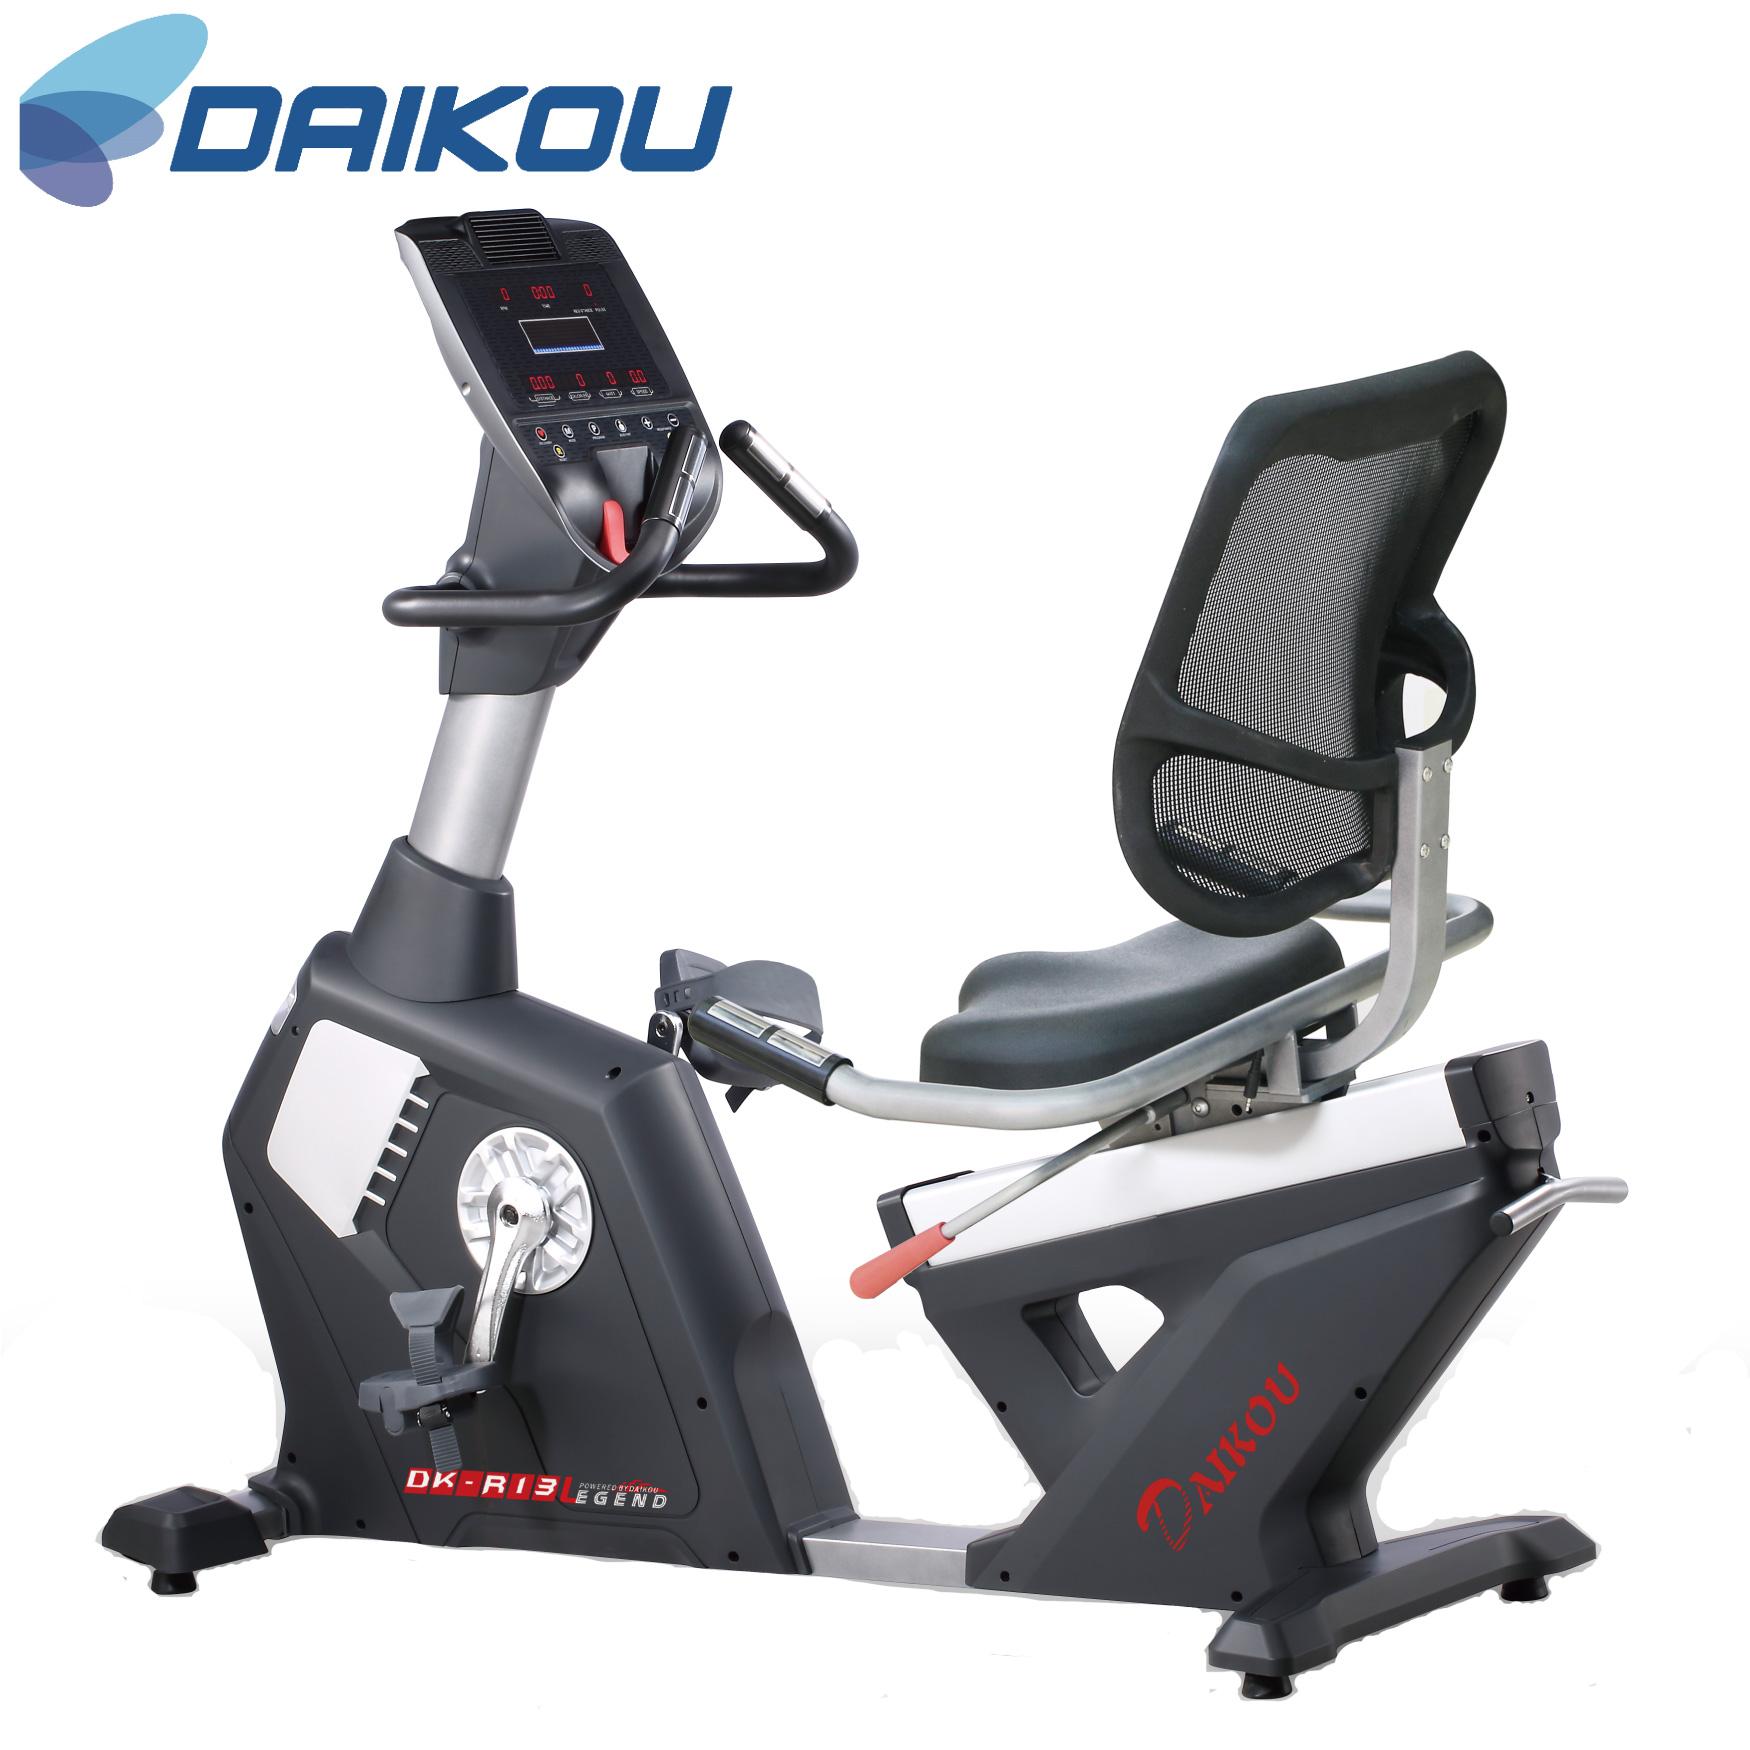 DK-R13/準業務用リカンベントバイク《DAIKOU(ダイコー)》